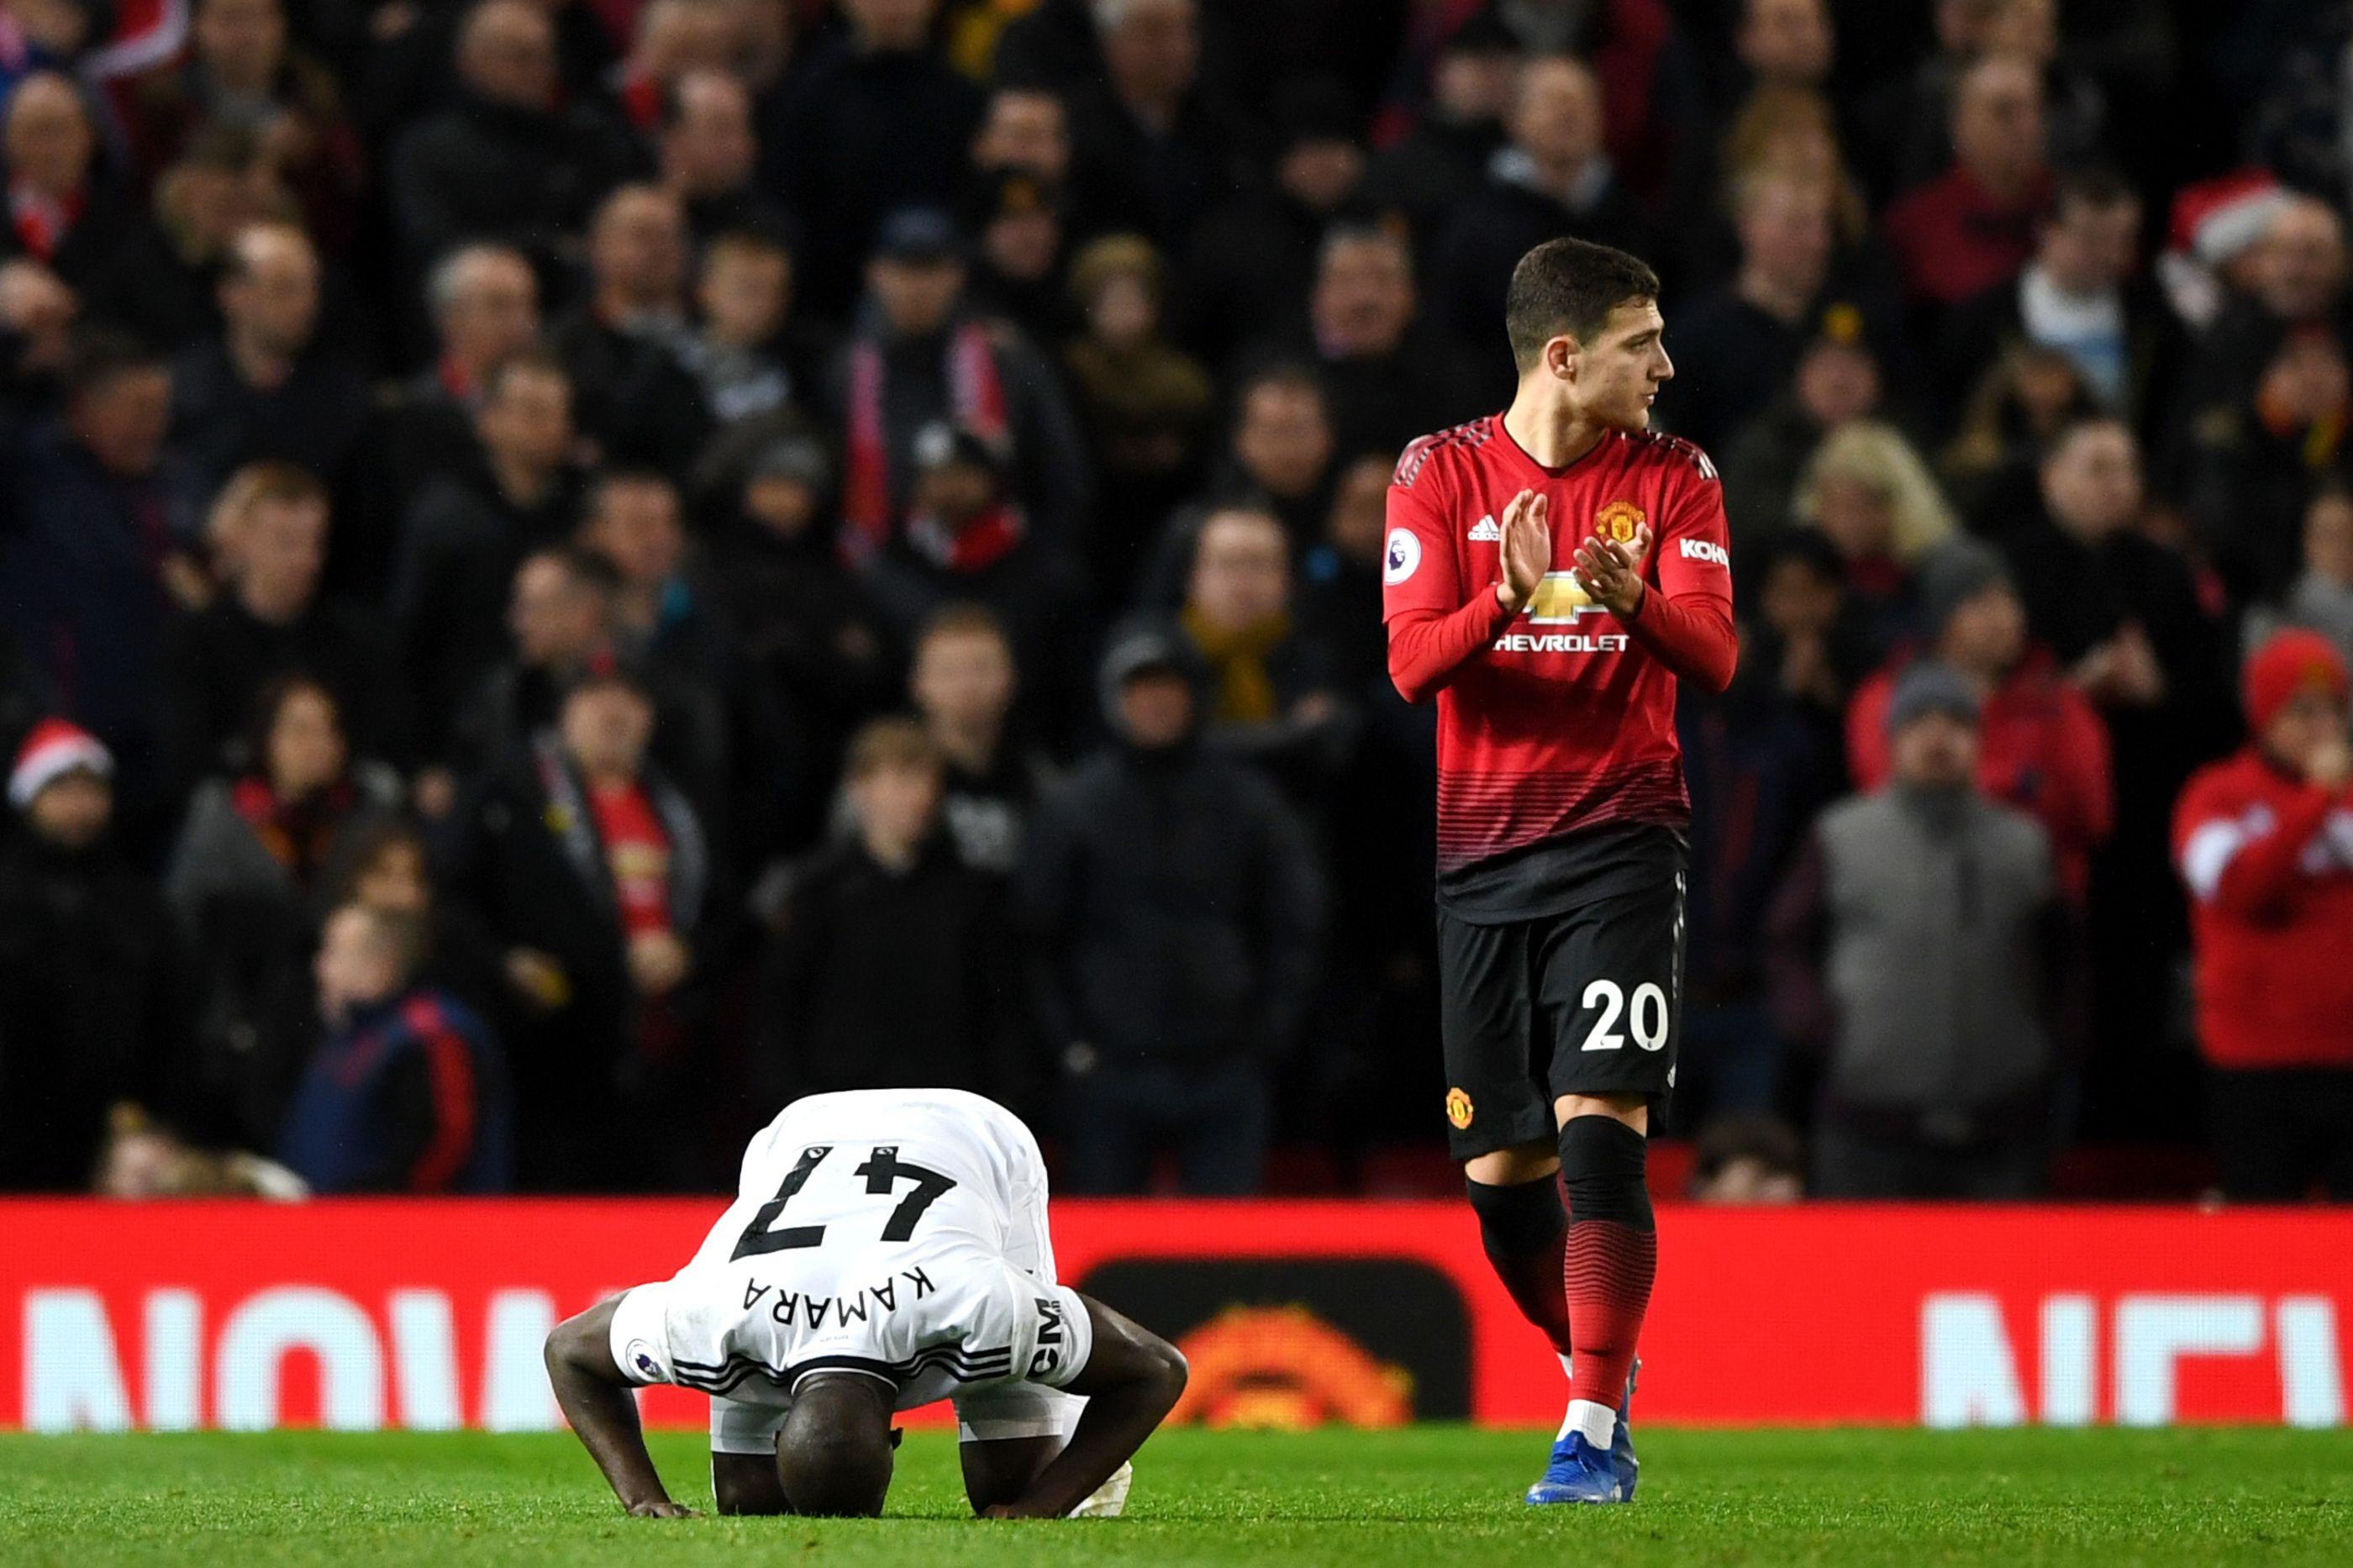 Dalot volta a brilhar e deixa adeptos do Manchester United 'loucos'